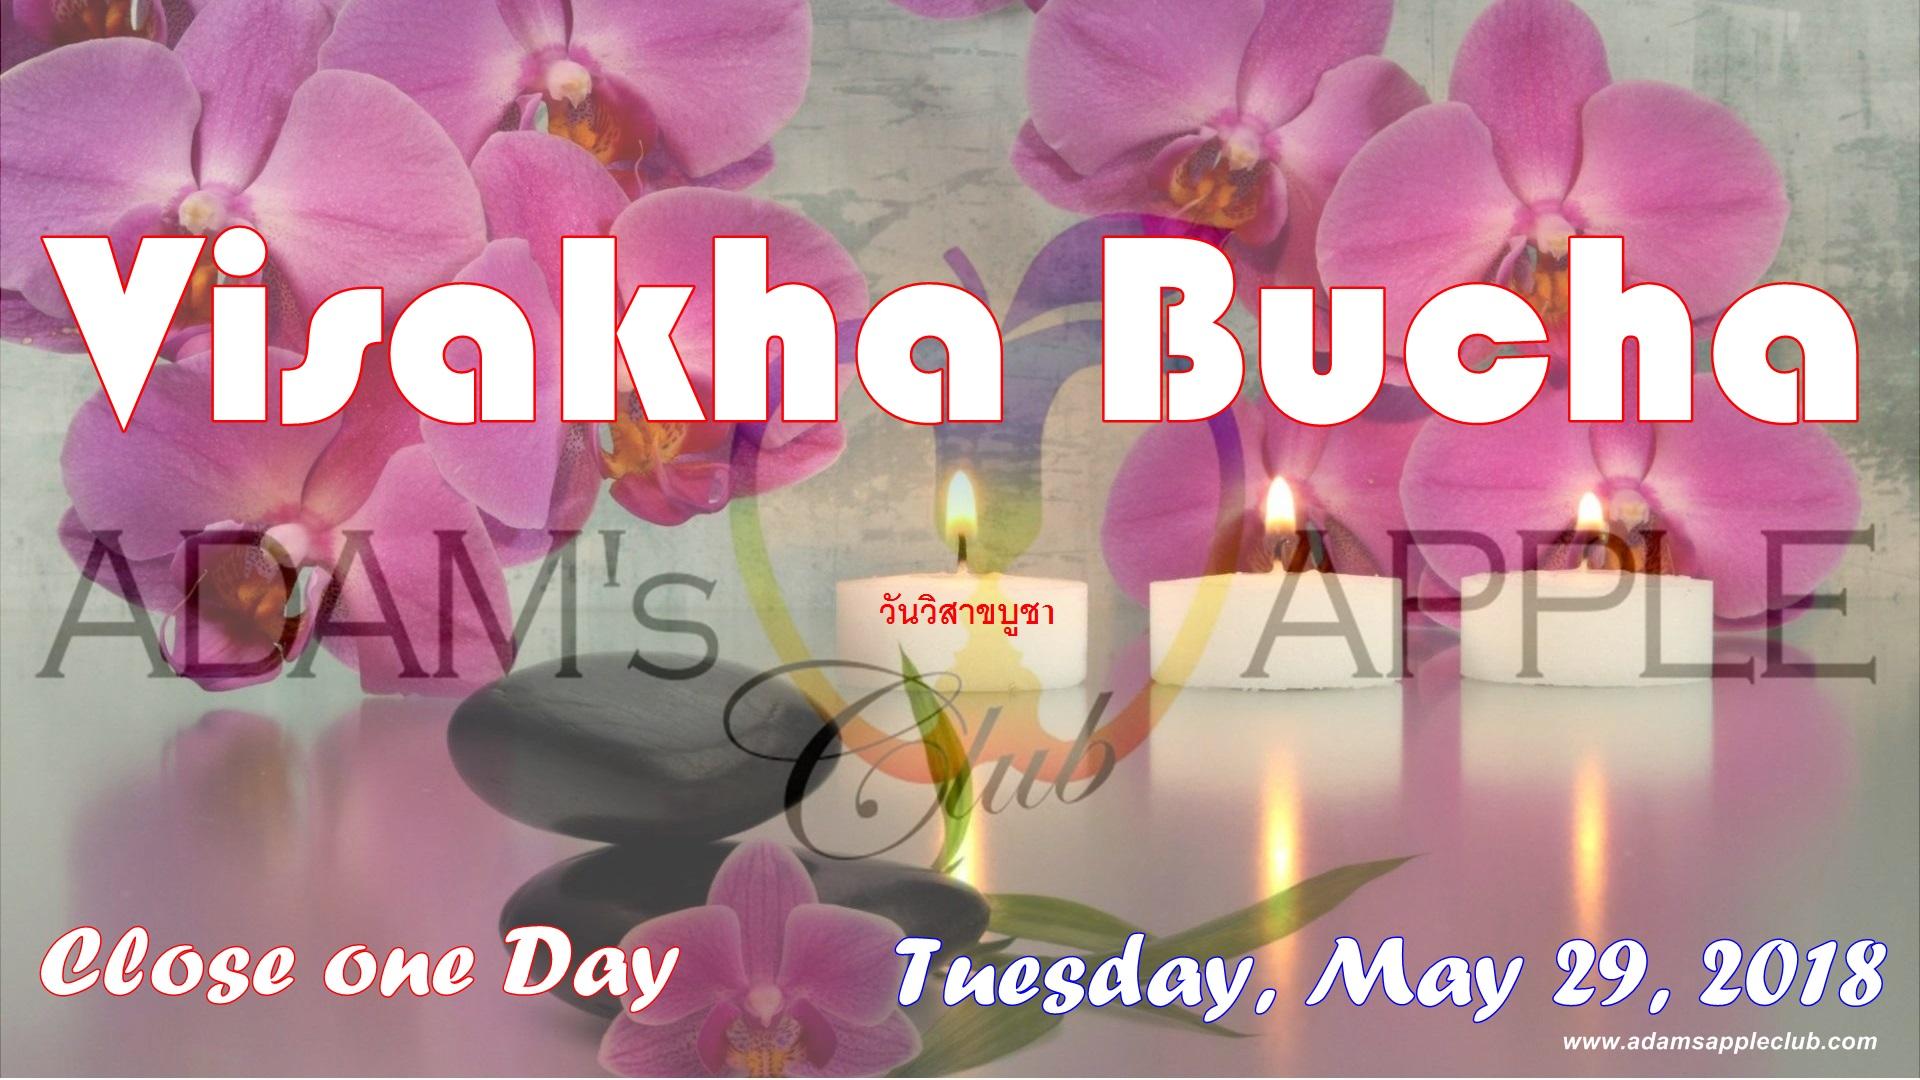 29.05.2018 May 29, Tuesday, Visakha Bucha.jpg